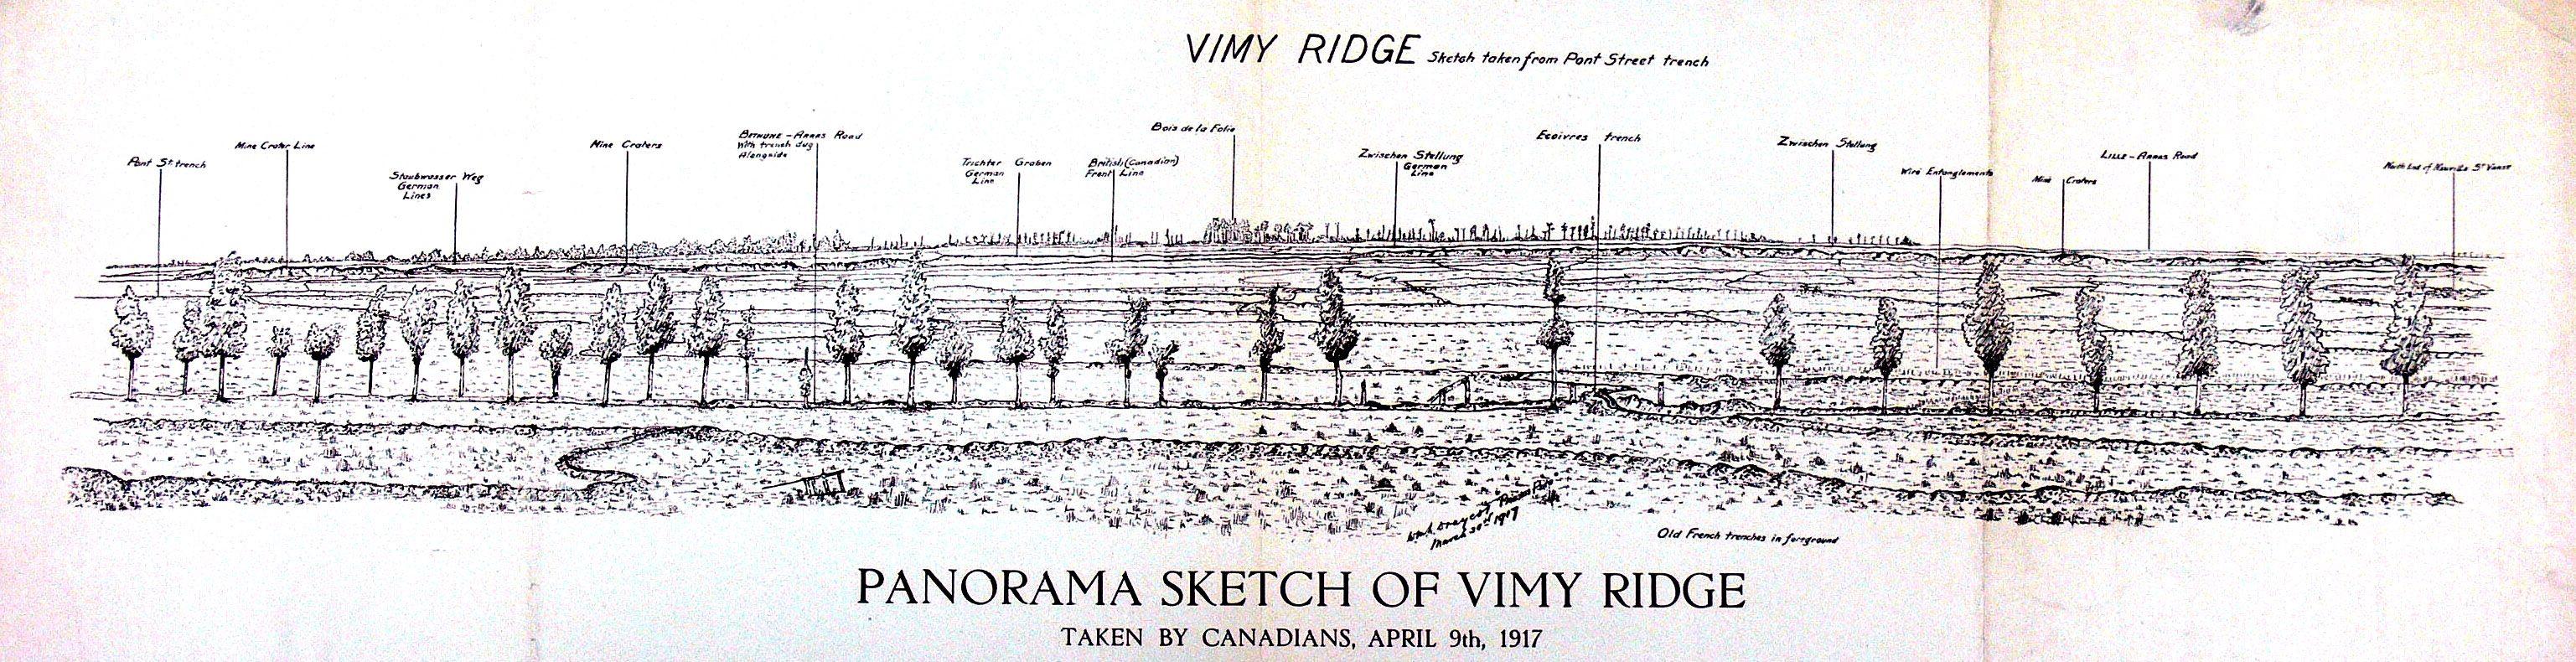 vimy_ridge_verdun